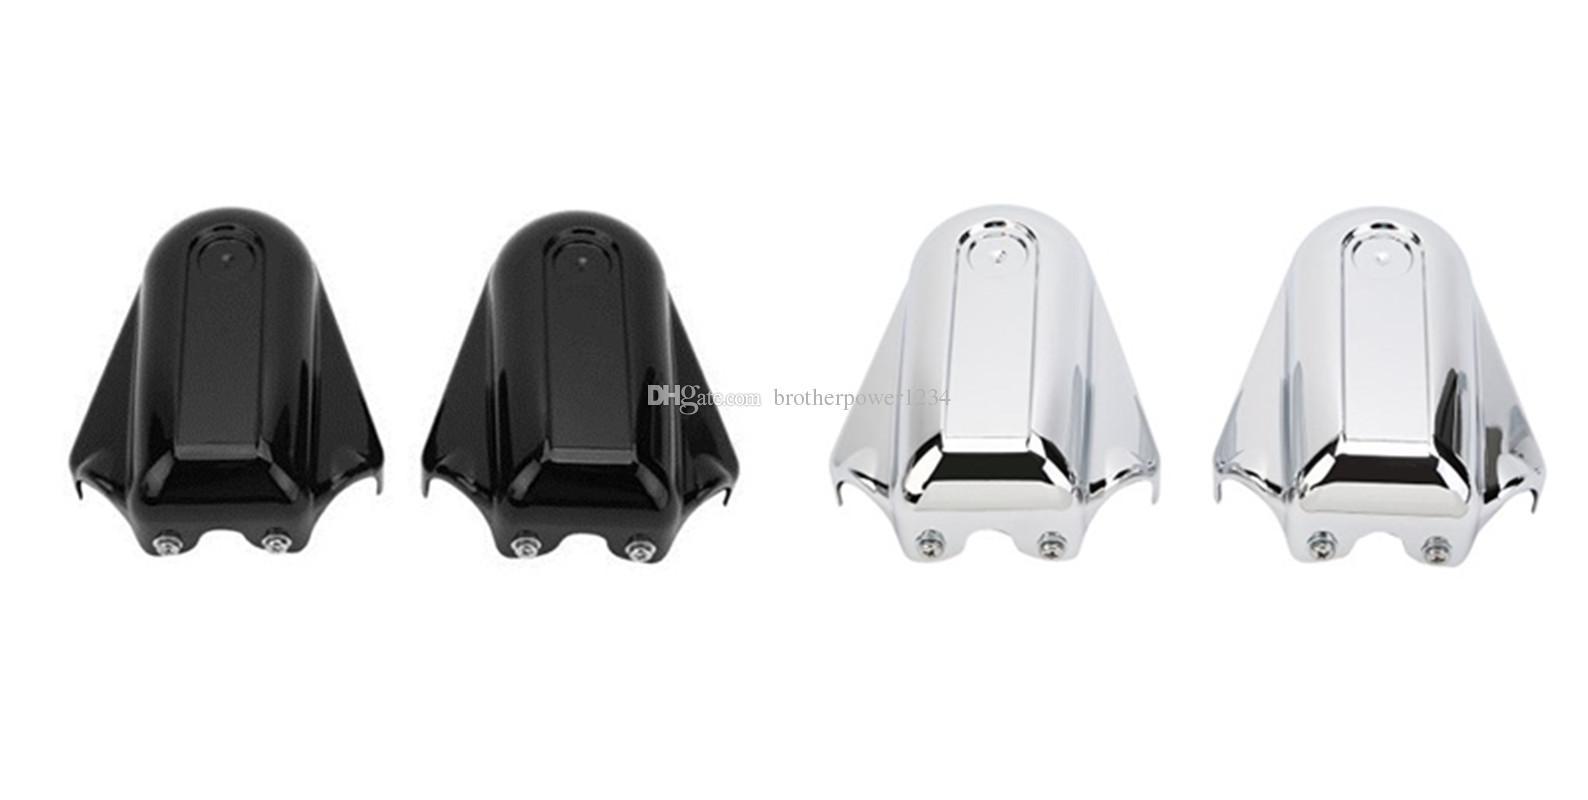 Chrome Phantom Bar Shield Rear Axle Covers For Softail Deluxe FLSTN 08-16 FXSTB